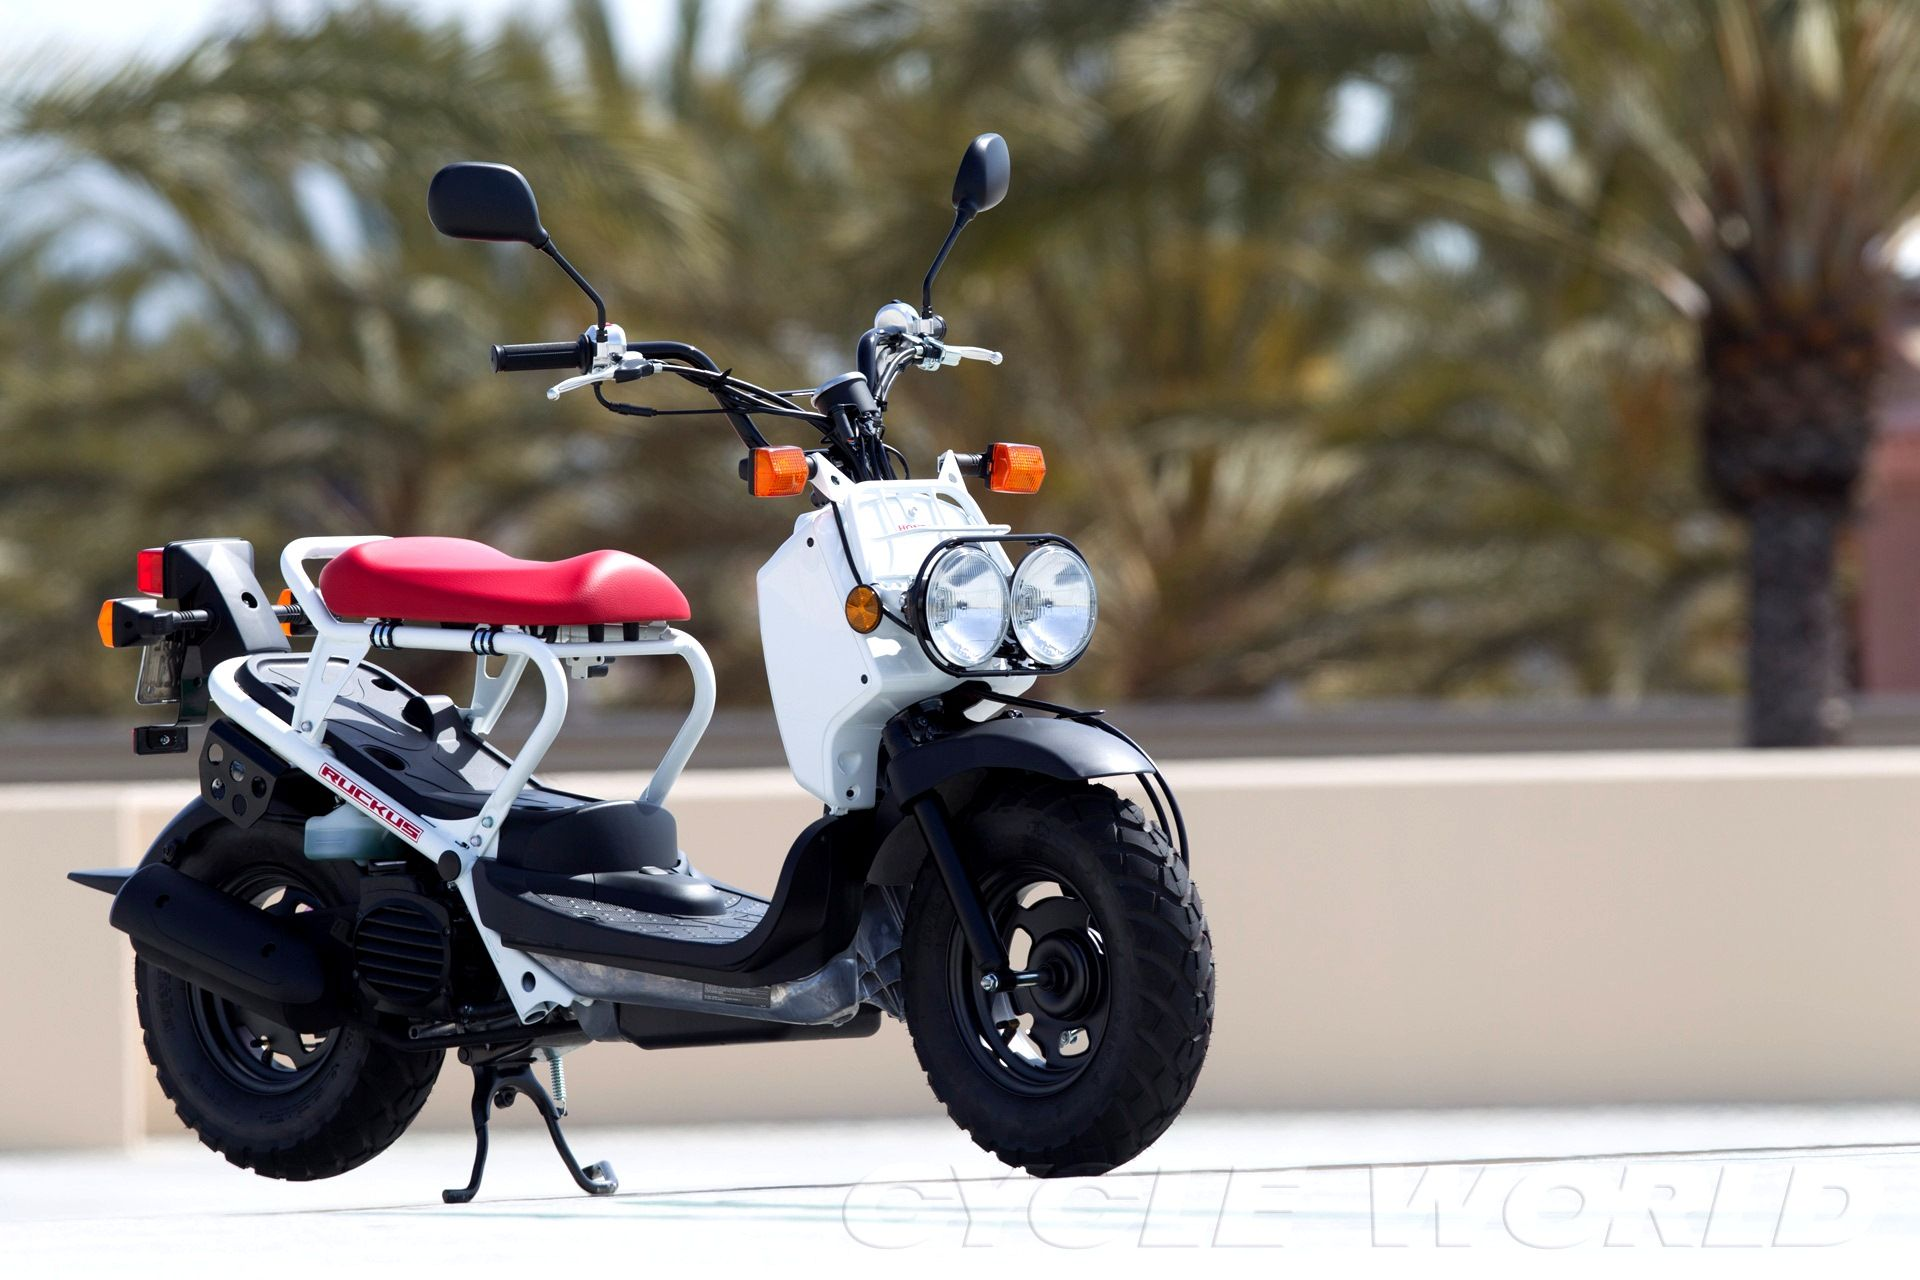 Honda-Ruckus-Image-HD.jpg (1920×1280) | transportation | Pinterest